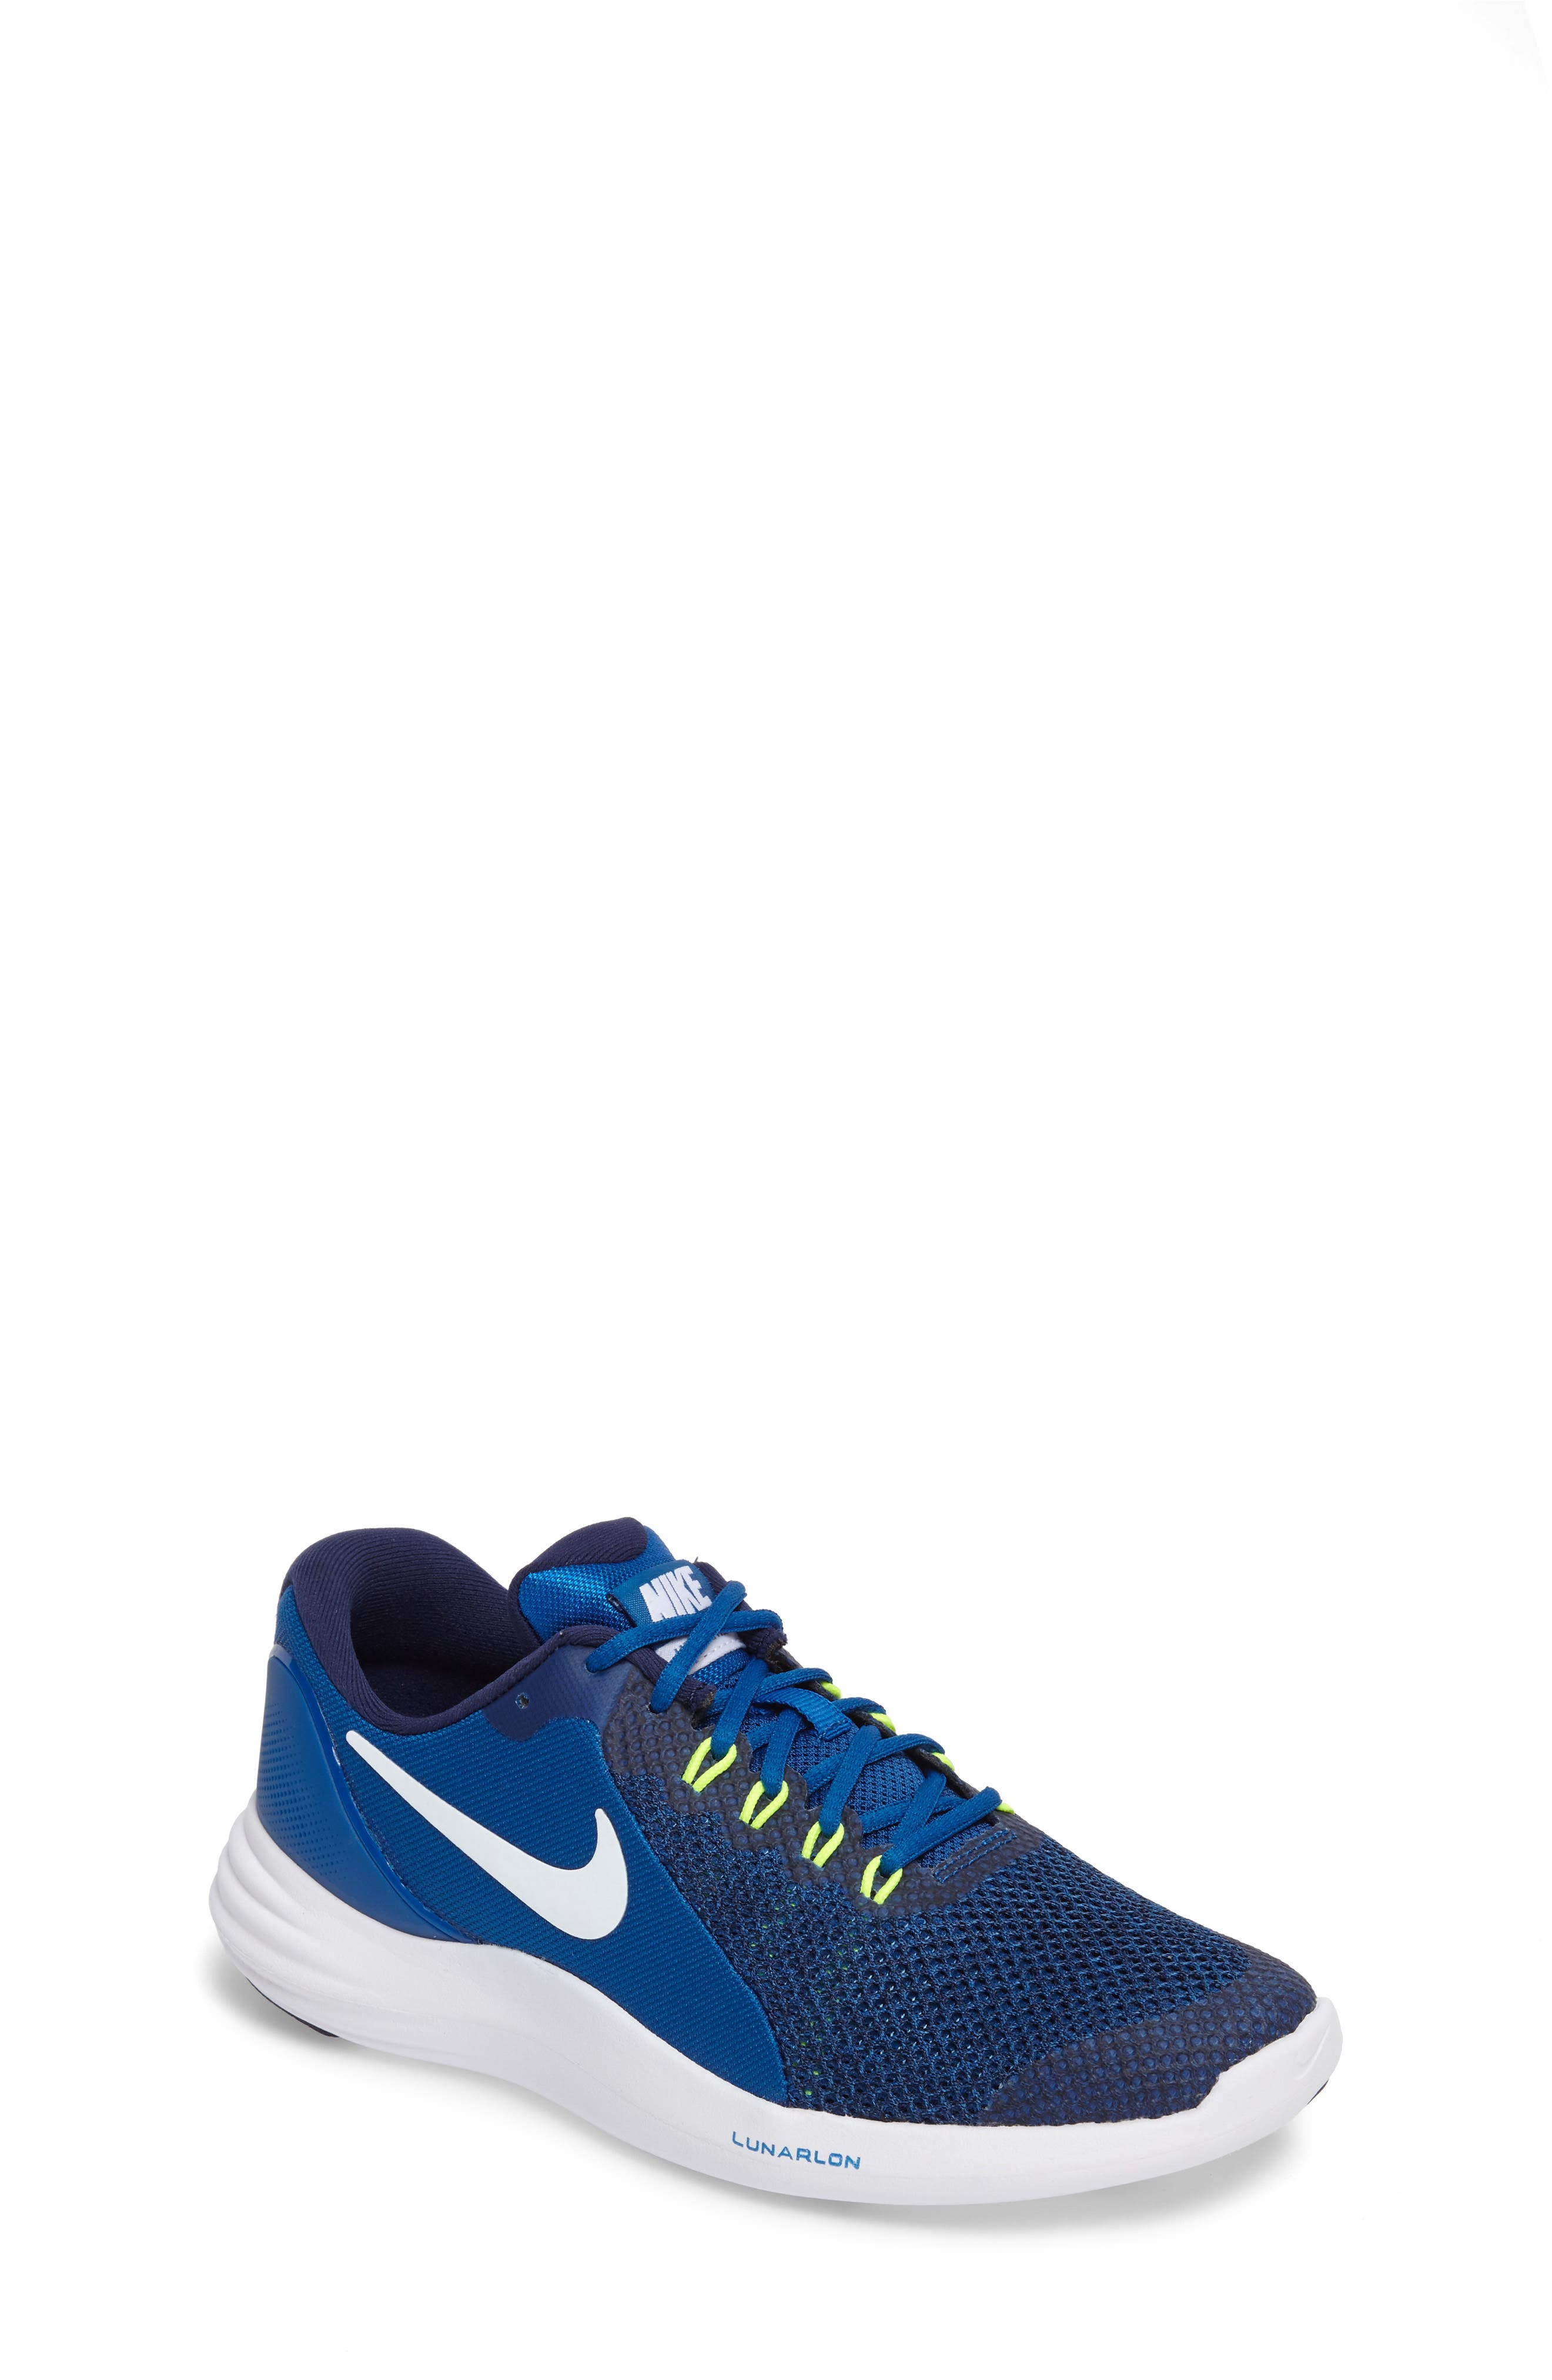 Nike Lunar Apparent GS Sneaker (Big Kid)